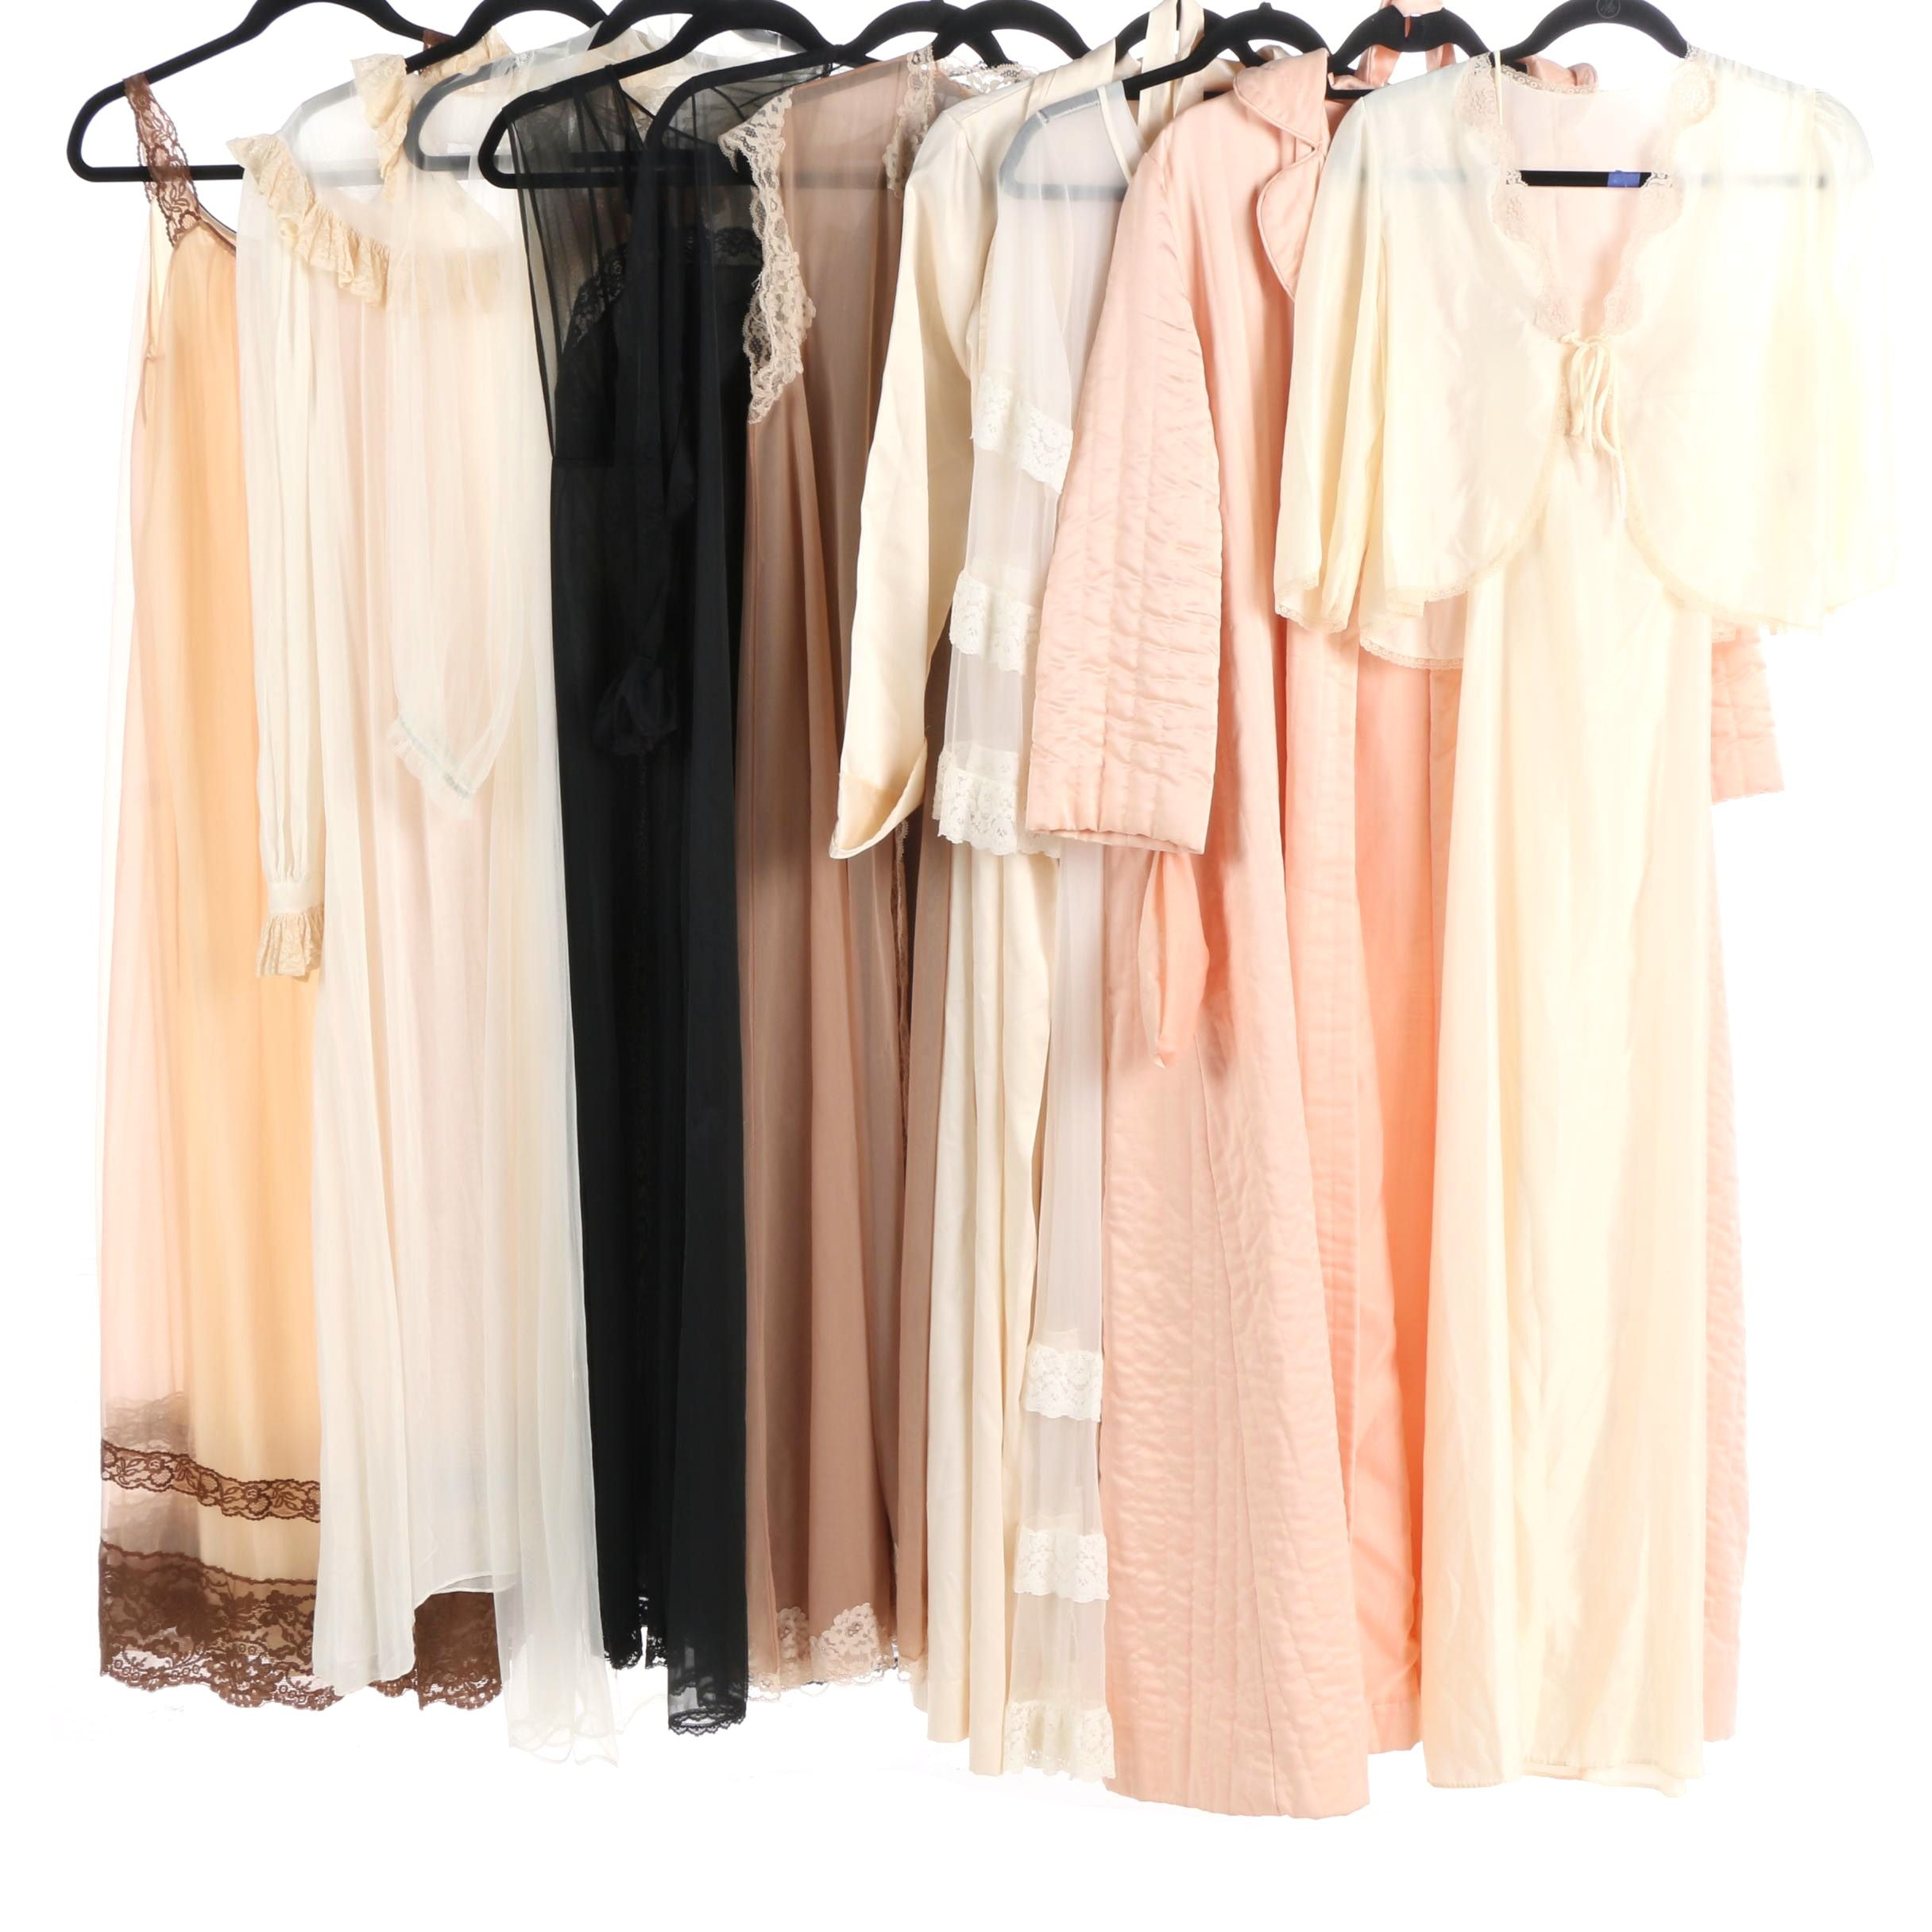 Women's Vintage Sleepwear and Robes